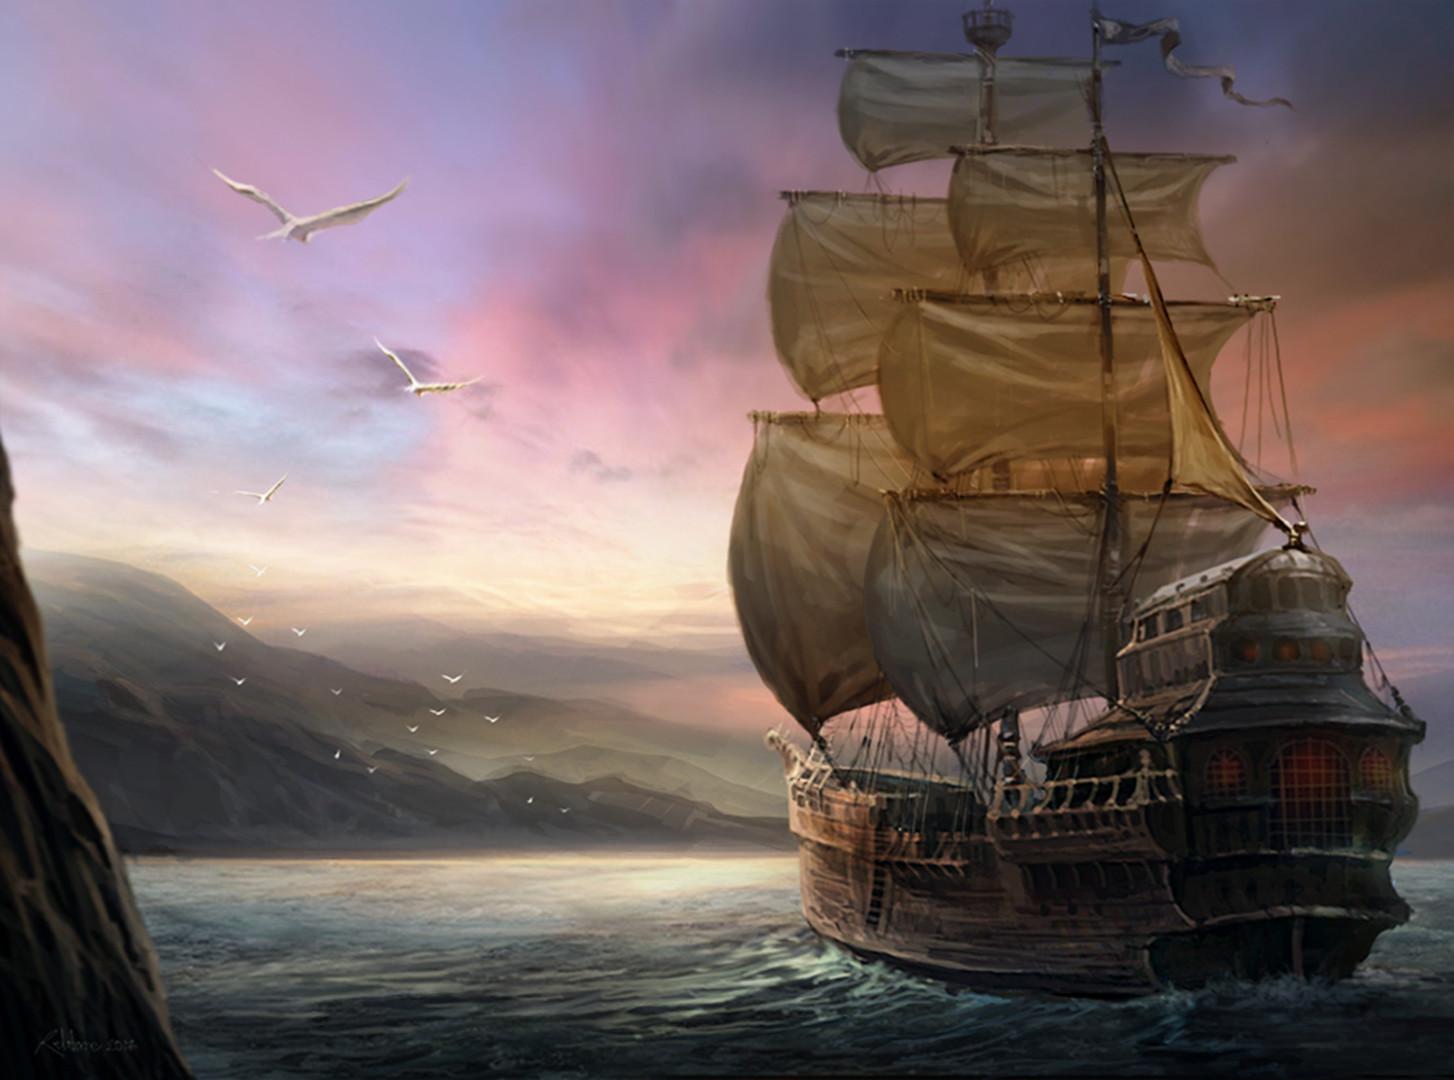 Chalmer relatorre pirate ship